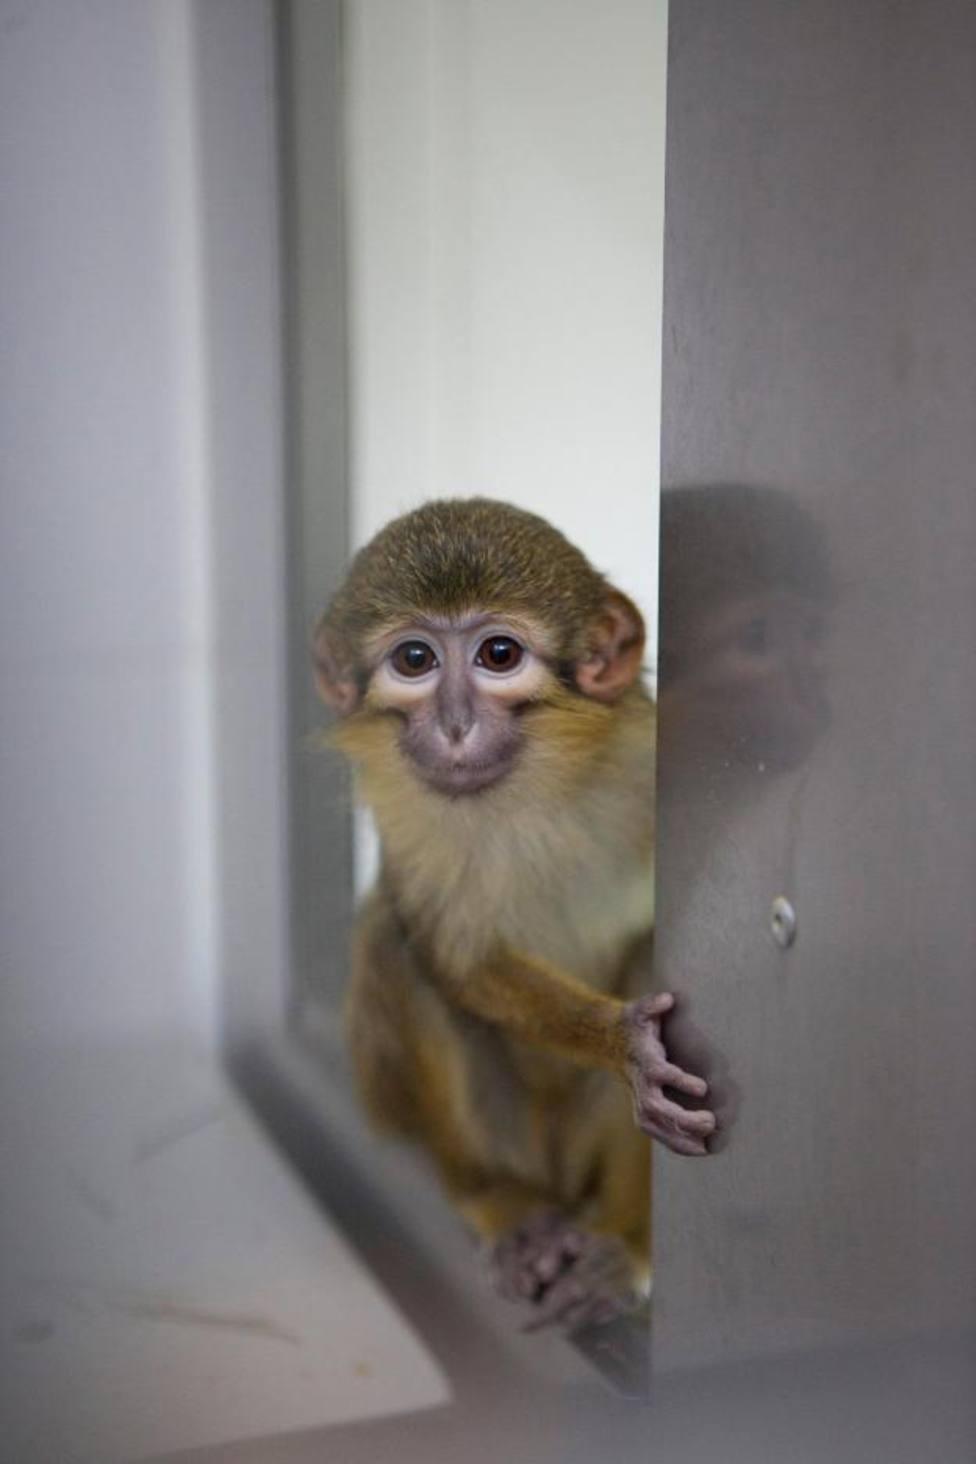 Un primate de Primadomus